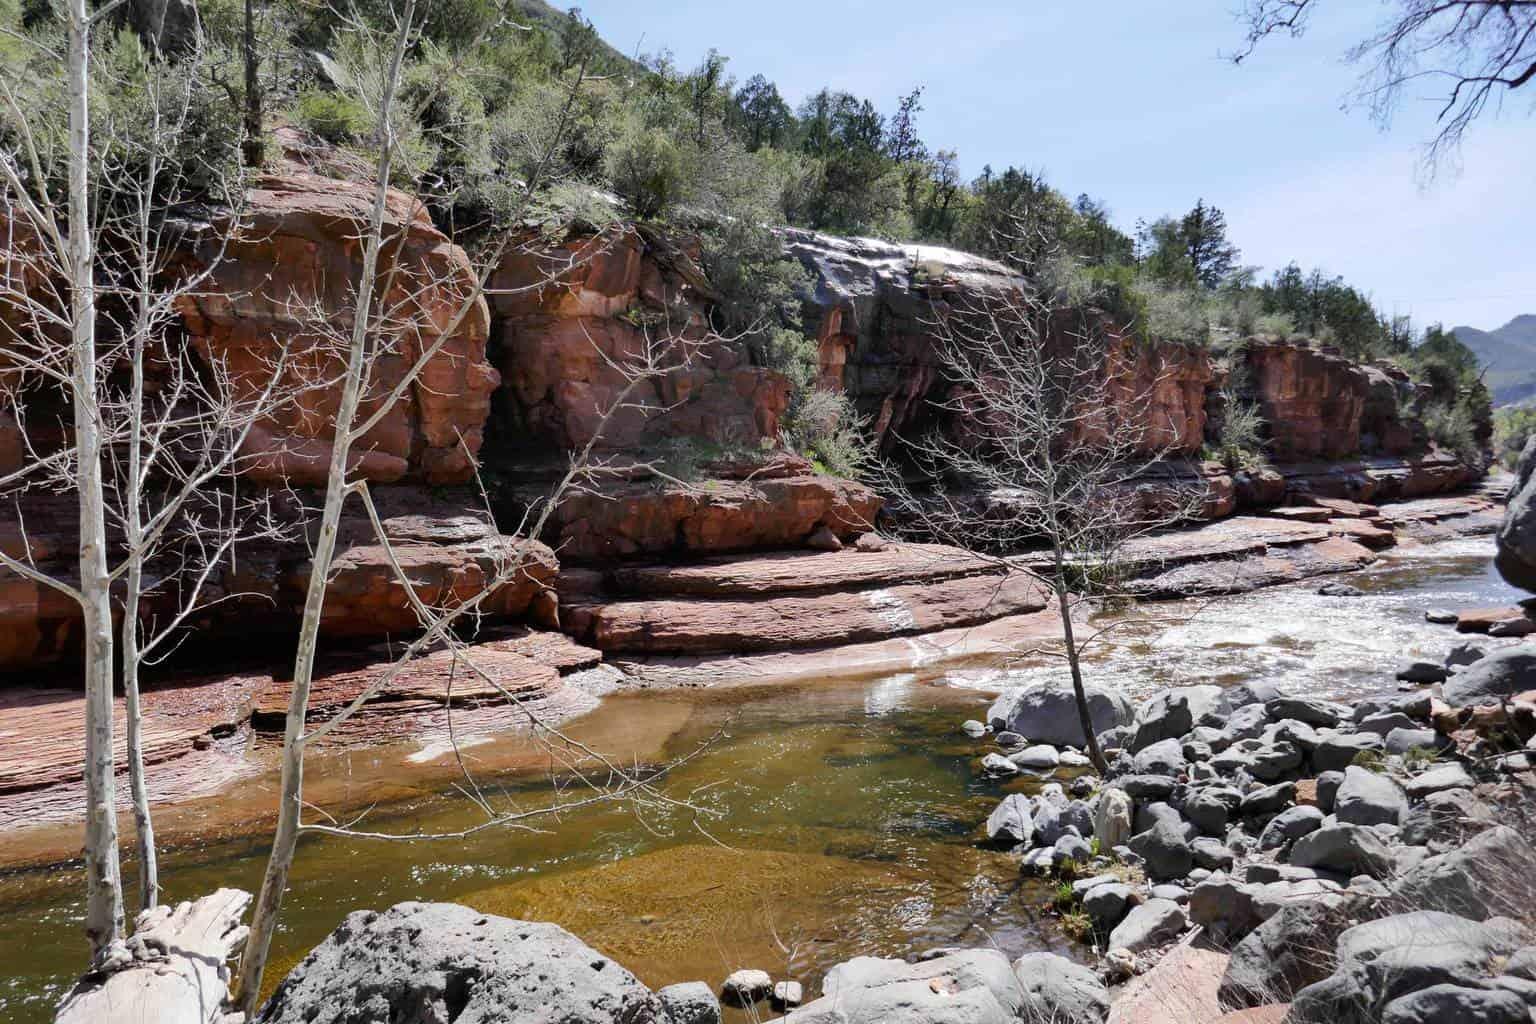 Tanque Verde Falls Trail: Waterfalls, pools & boulders in